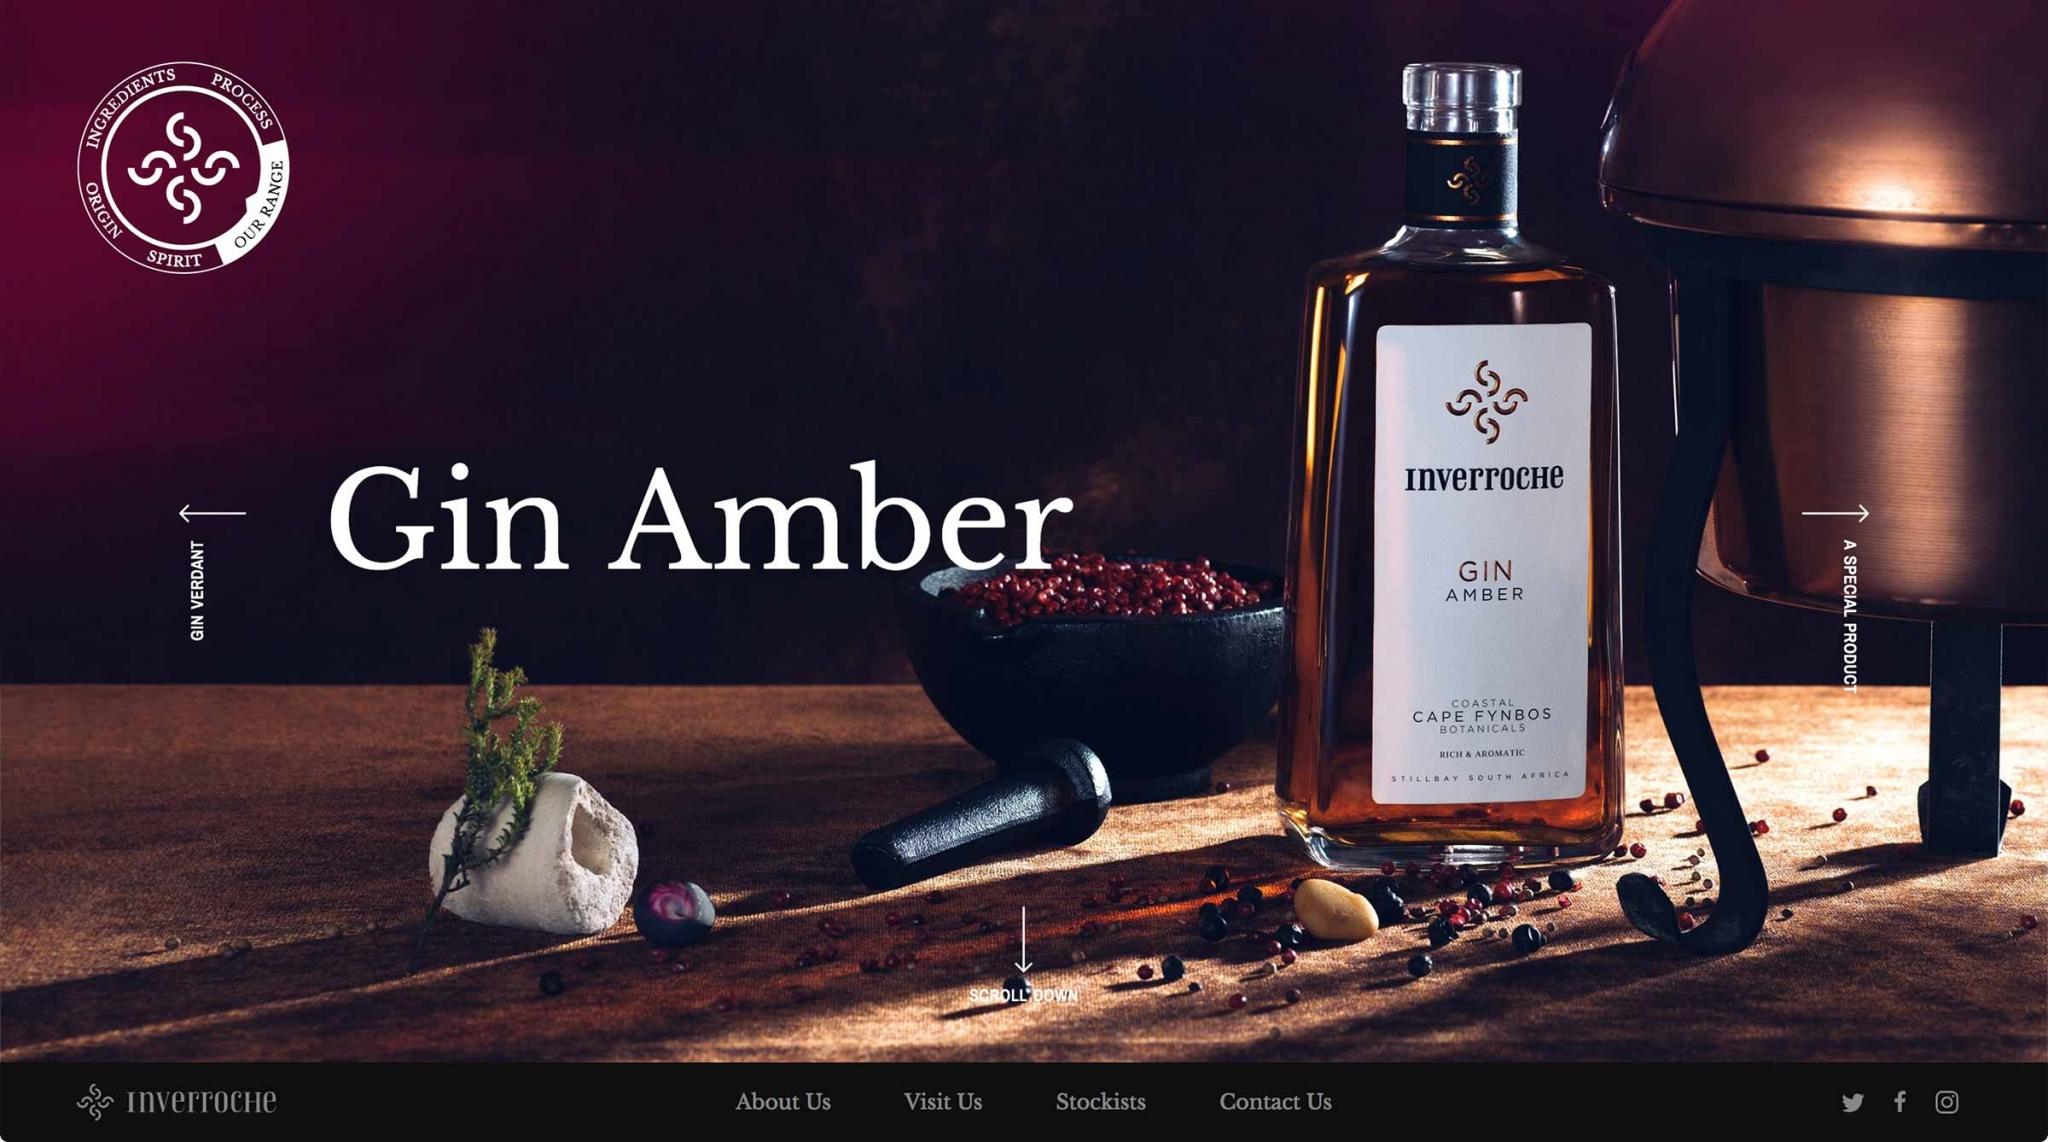 Gin Amber